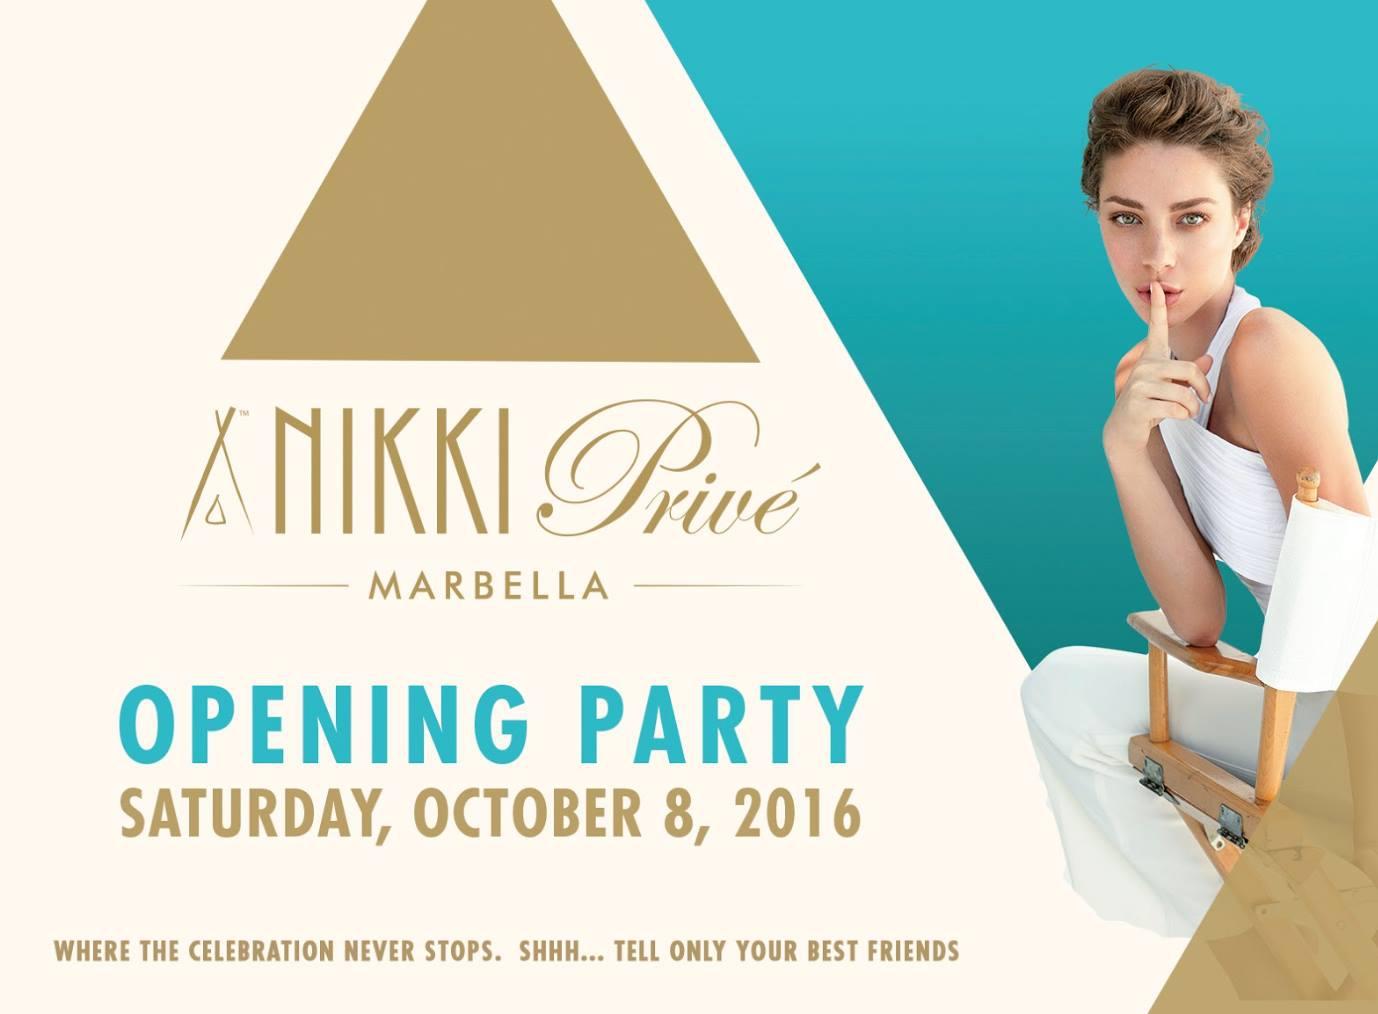 Opening Party Nikki Privé Marbella